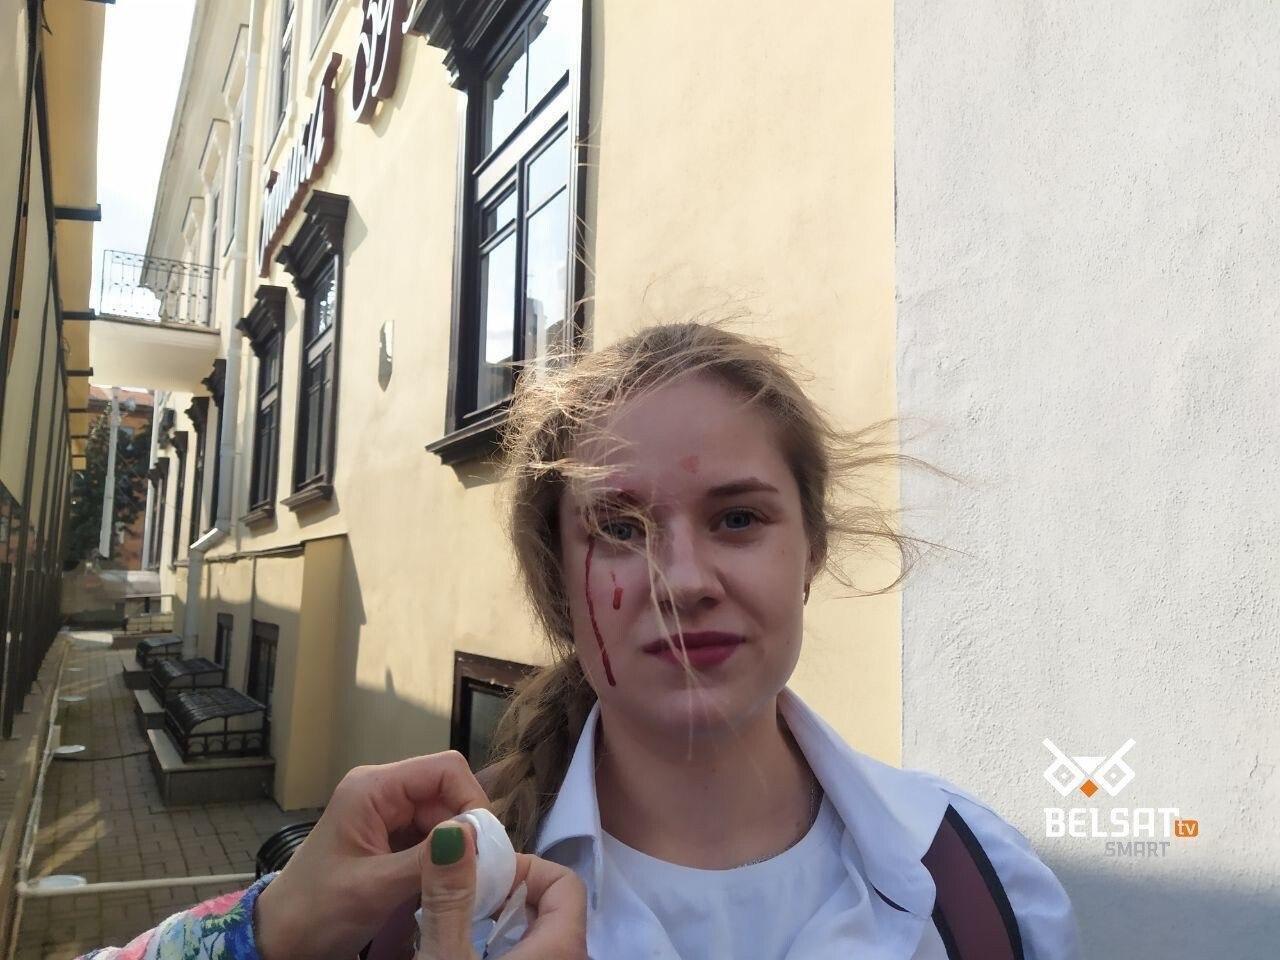 Силовик ударил девушку в лицо